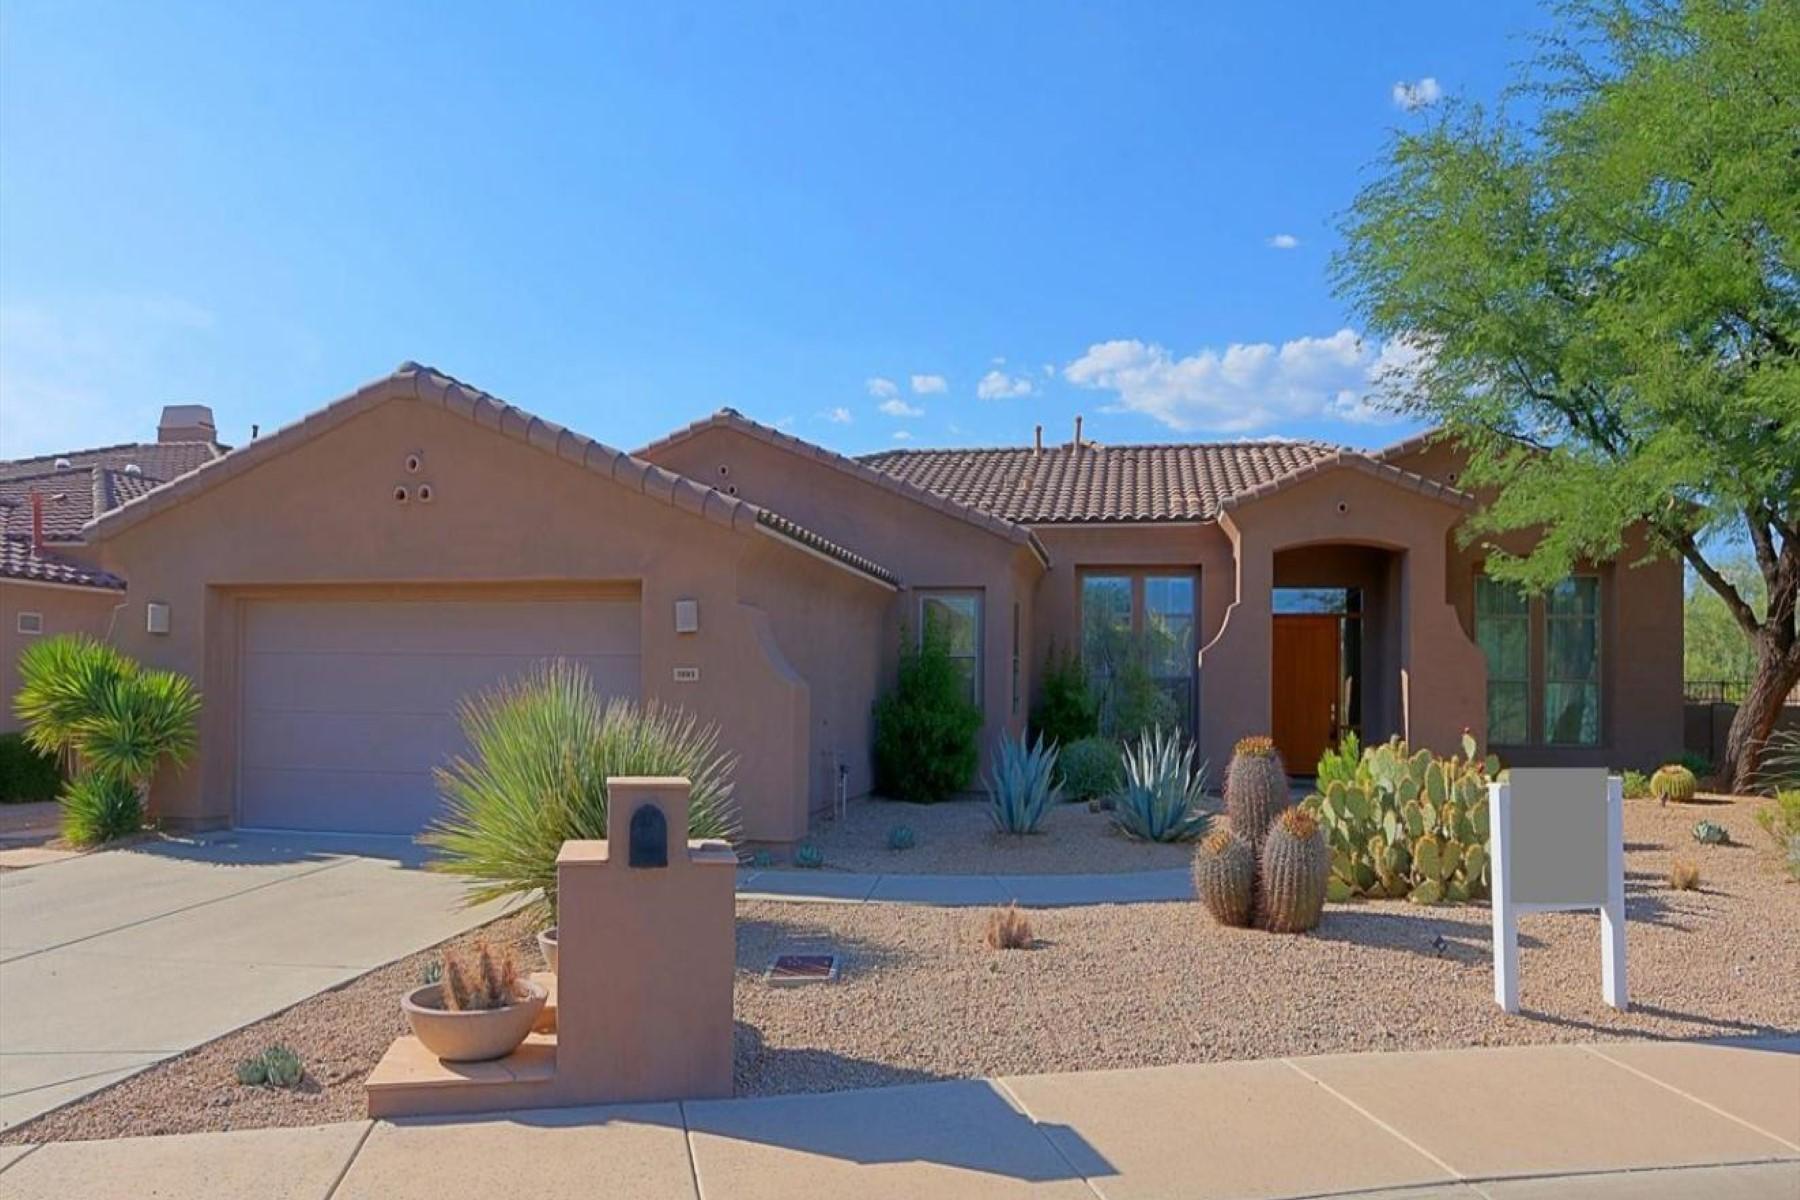 獨棟家庭住宅 為 出售 在 Resort Style Community 7882 E Evening Glow Dr Scottsdale, 亞利桑那州, 85266 美國